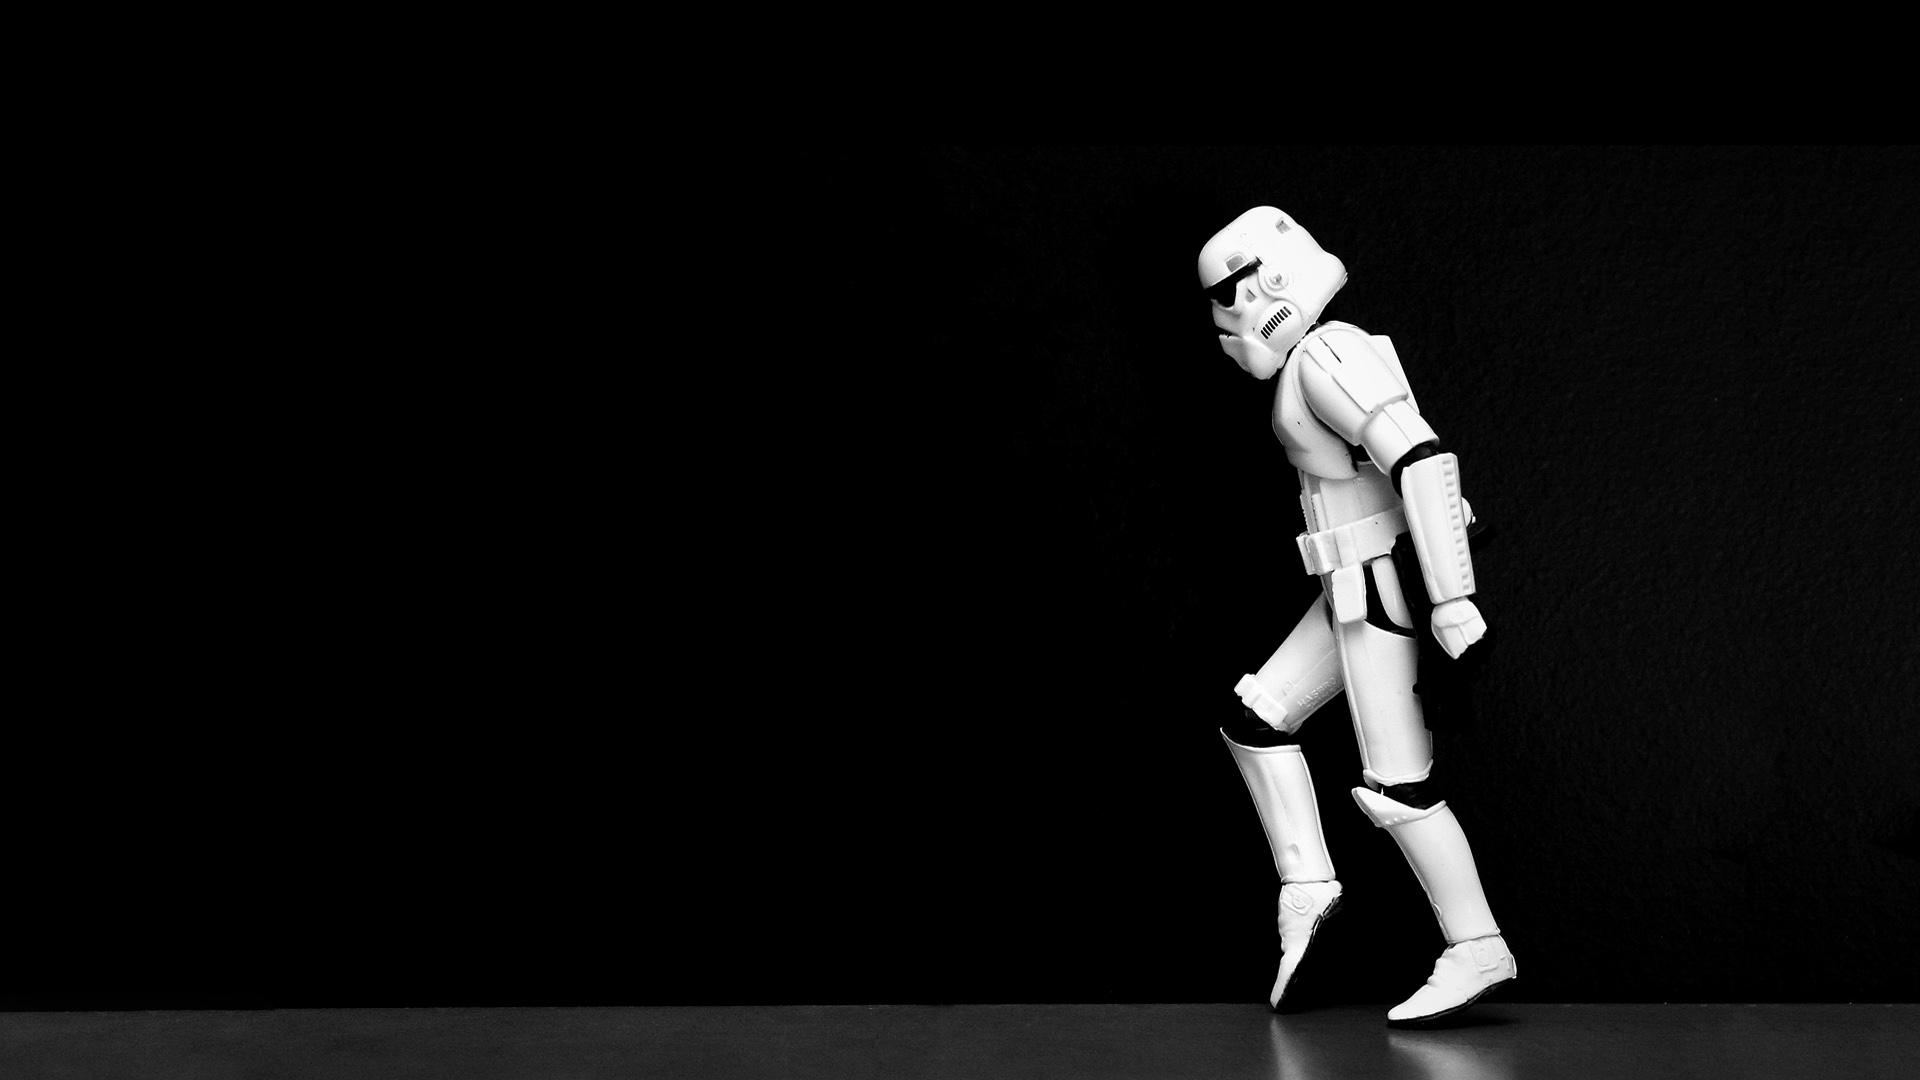 Star Wars Wallpaper 1920x1080 Star Wars Stormtroopers Moonwalk 1920x1080